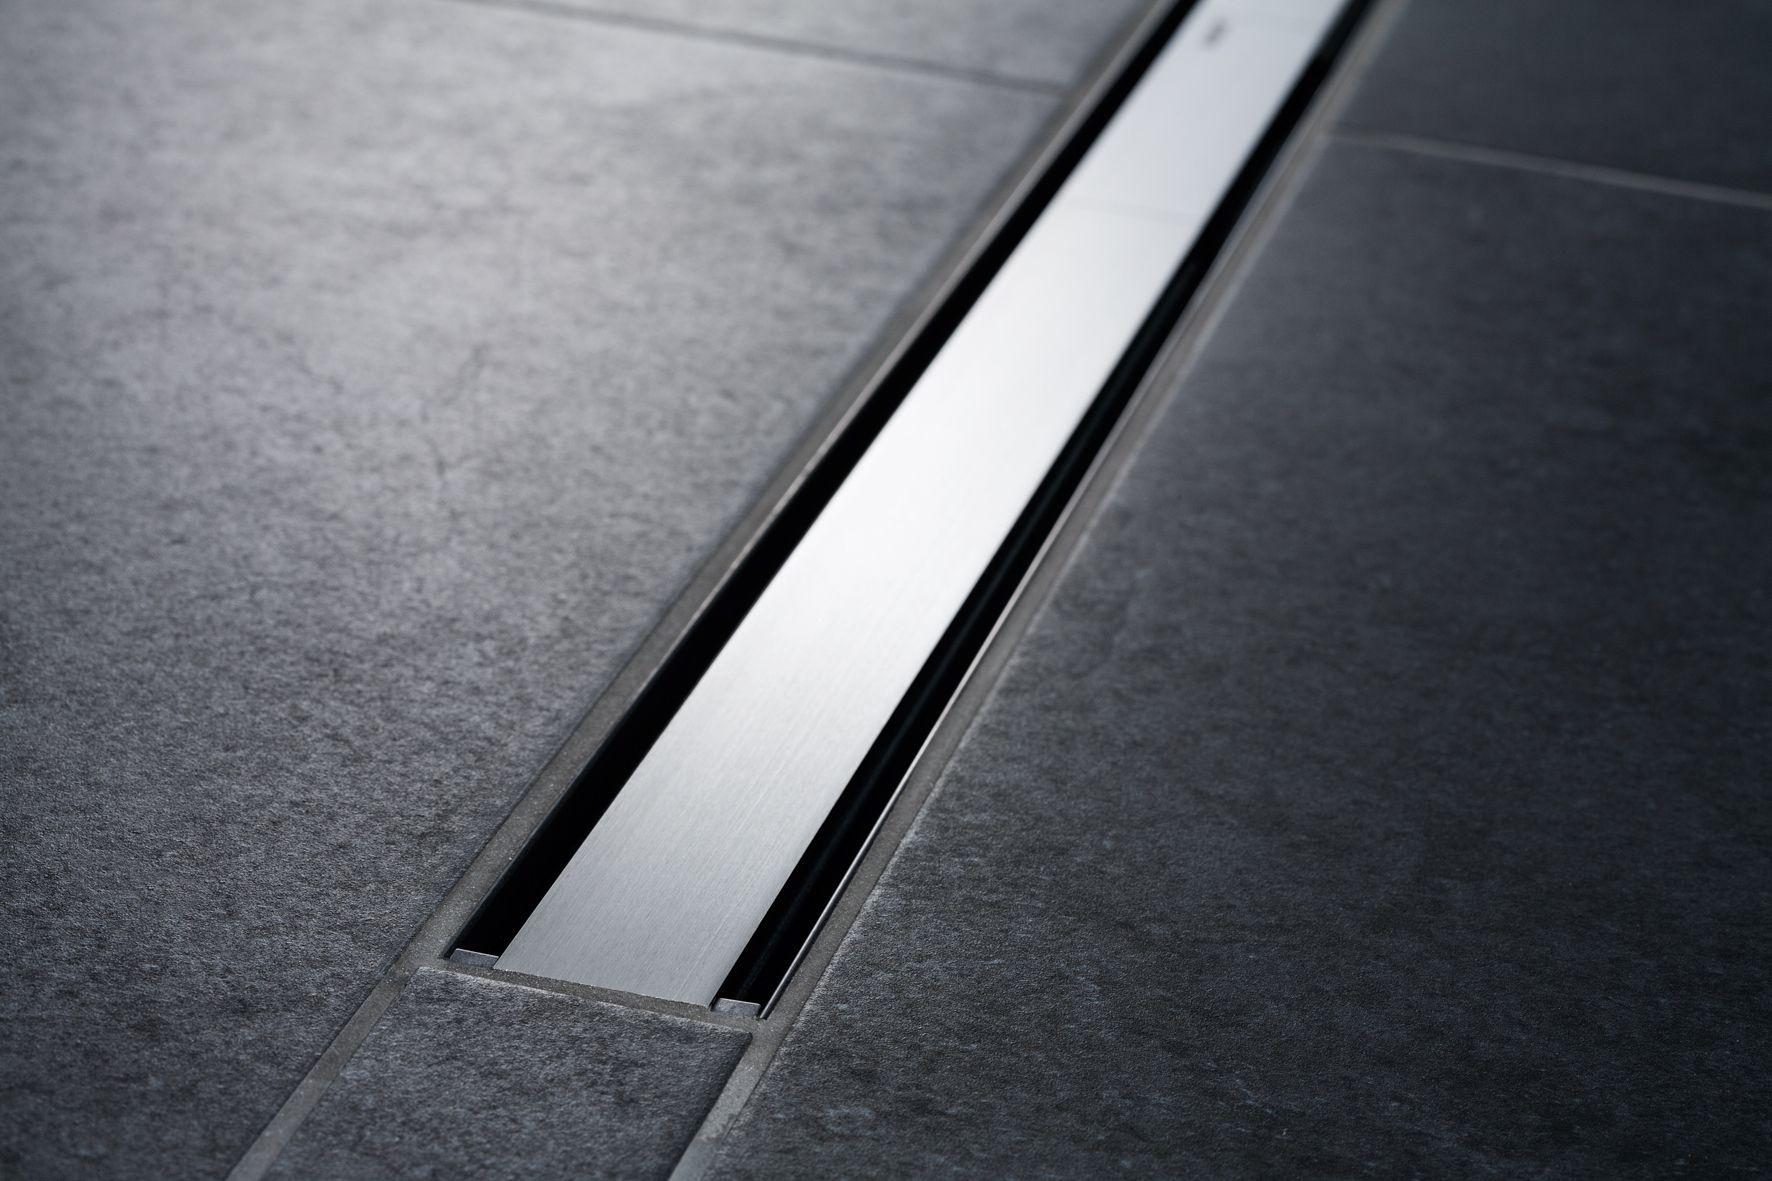 geberit cleanline60 duschrinne 30 90cm metall dunkel metall geb rstet b dermaxx. Black Bedroom Furniture Sets. Home Design Ideas